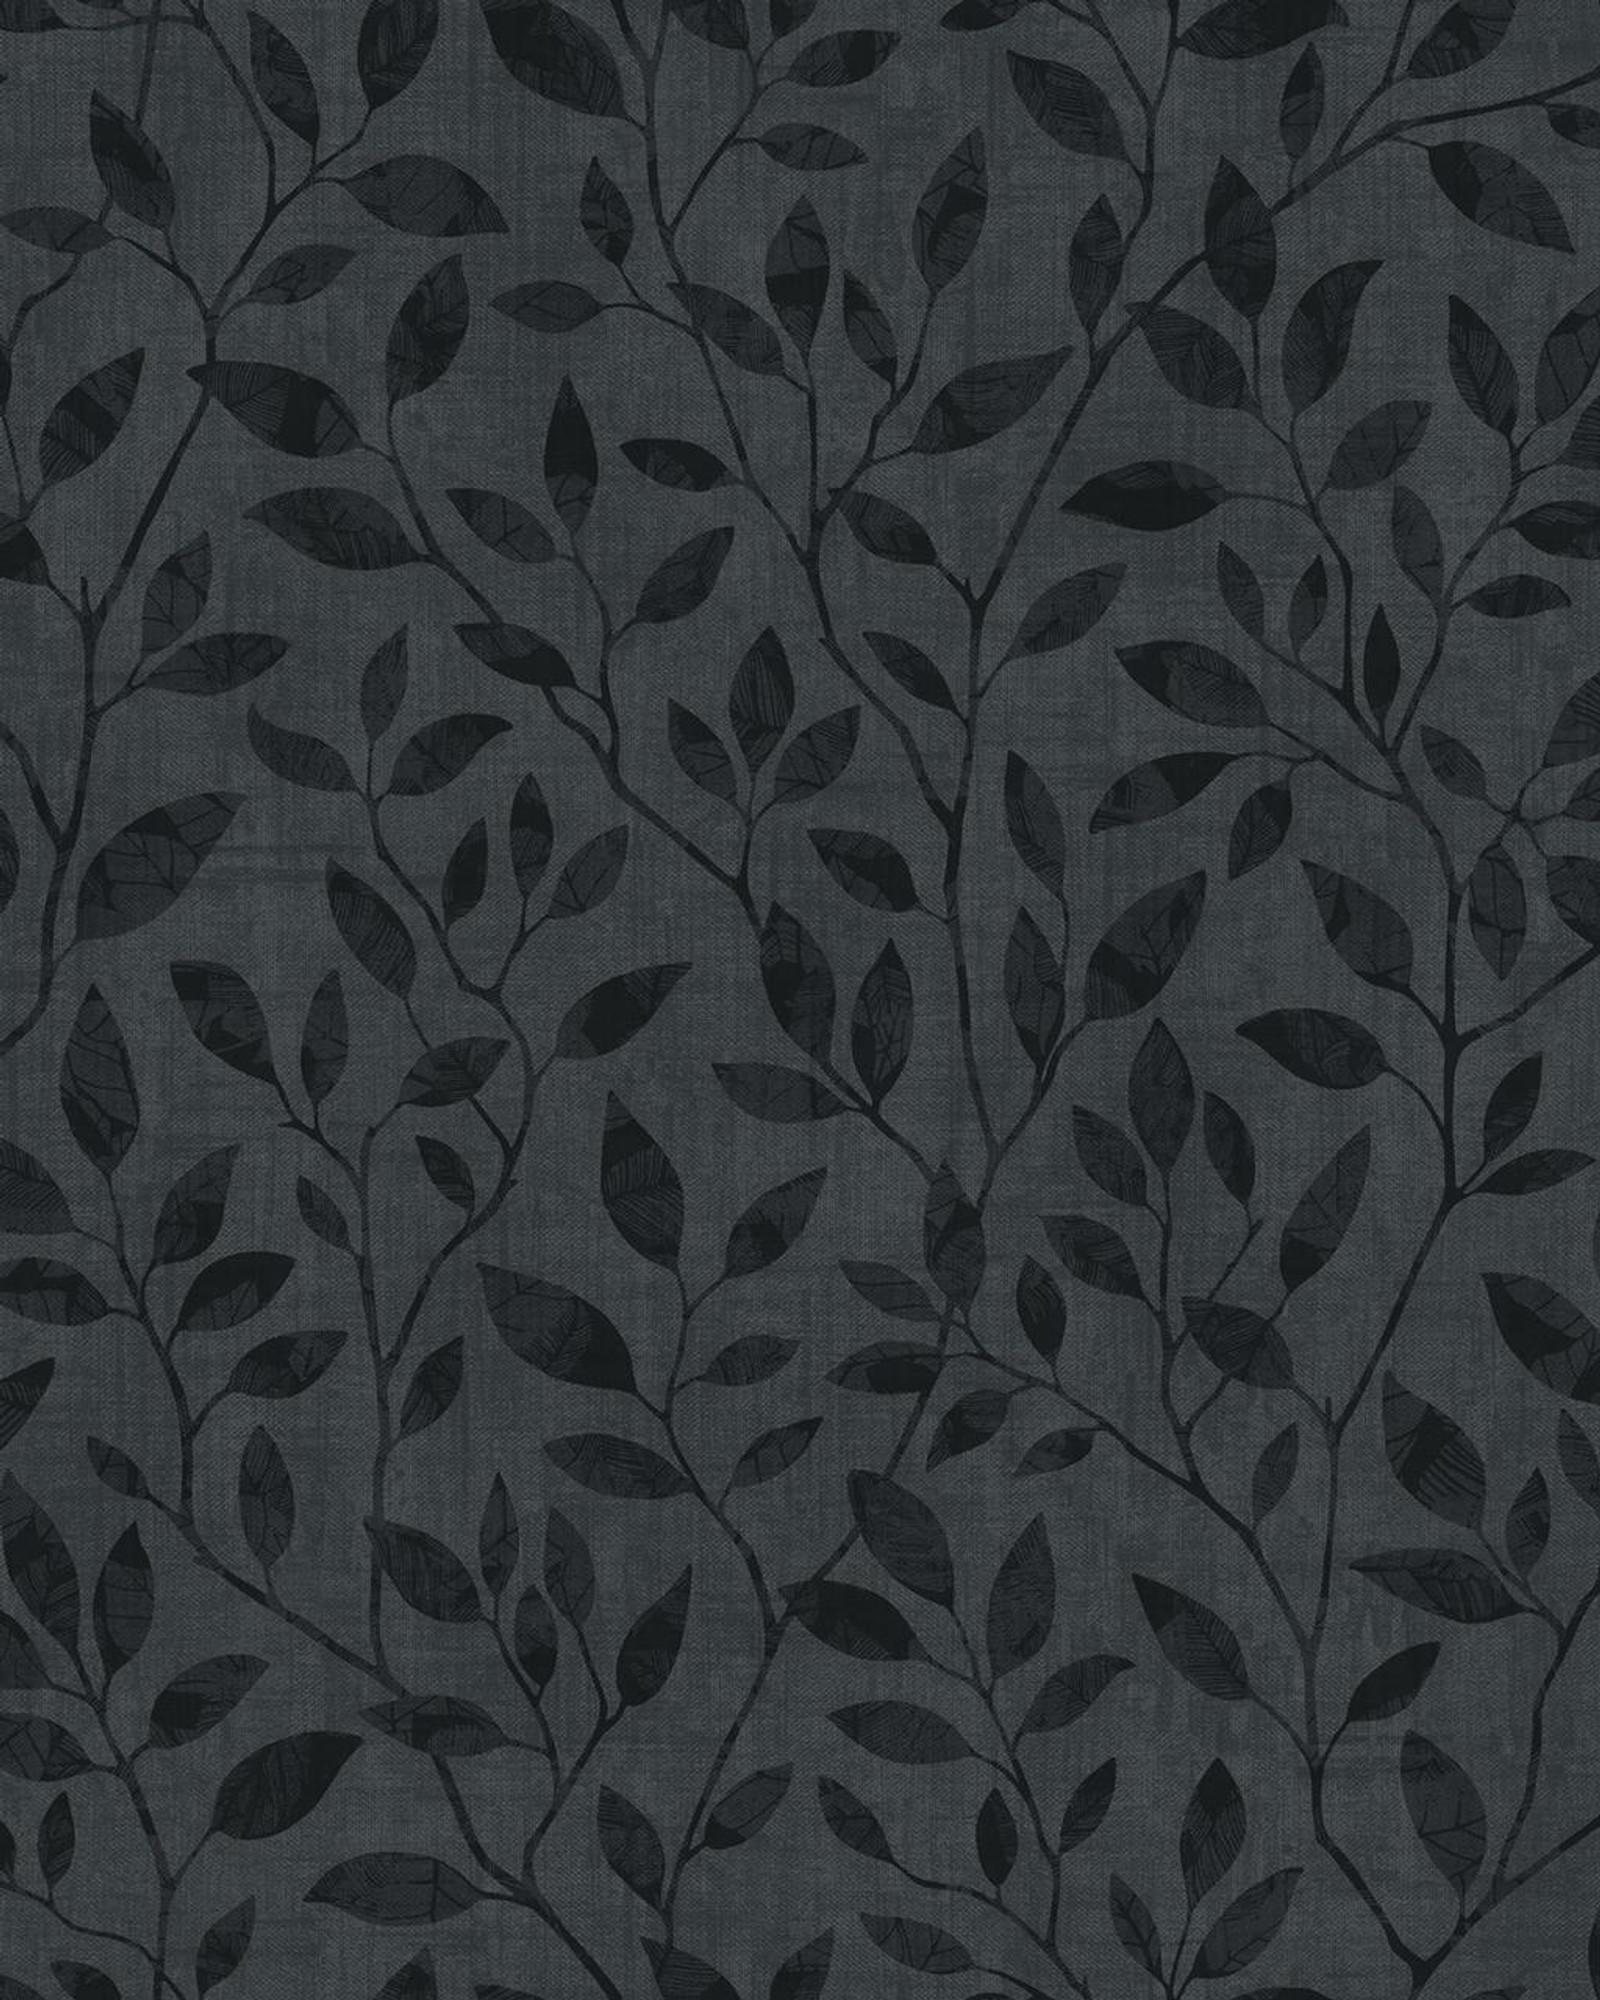 Willow Black Grey